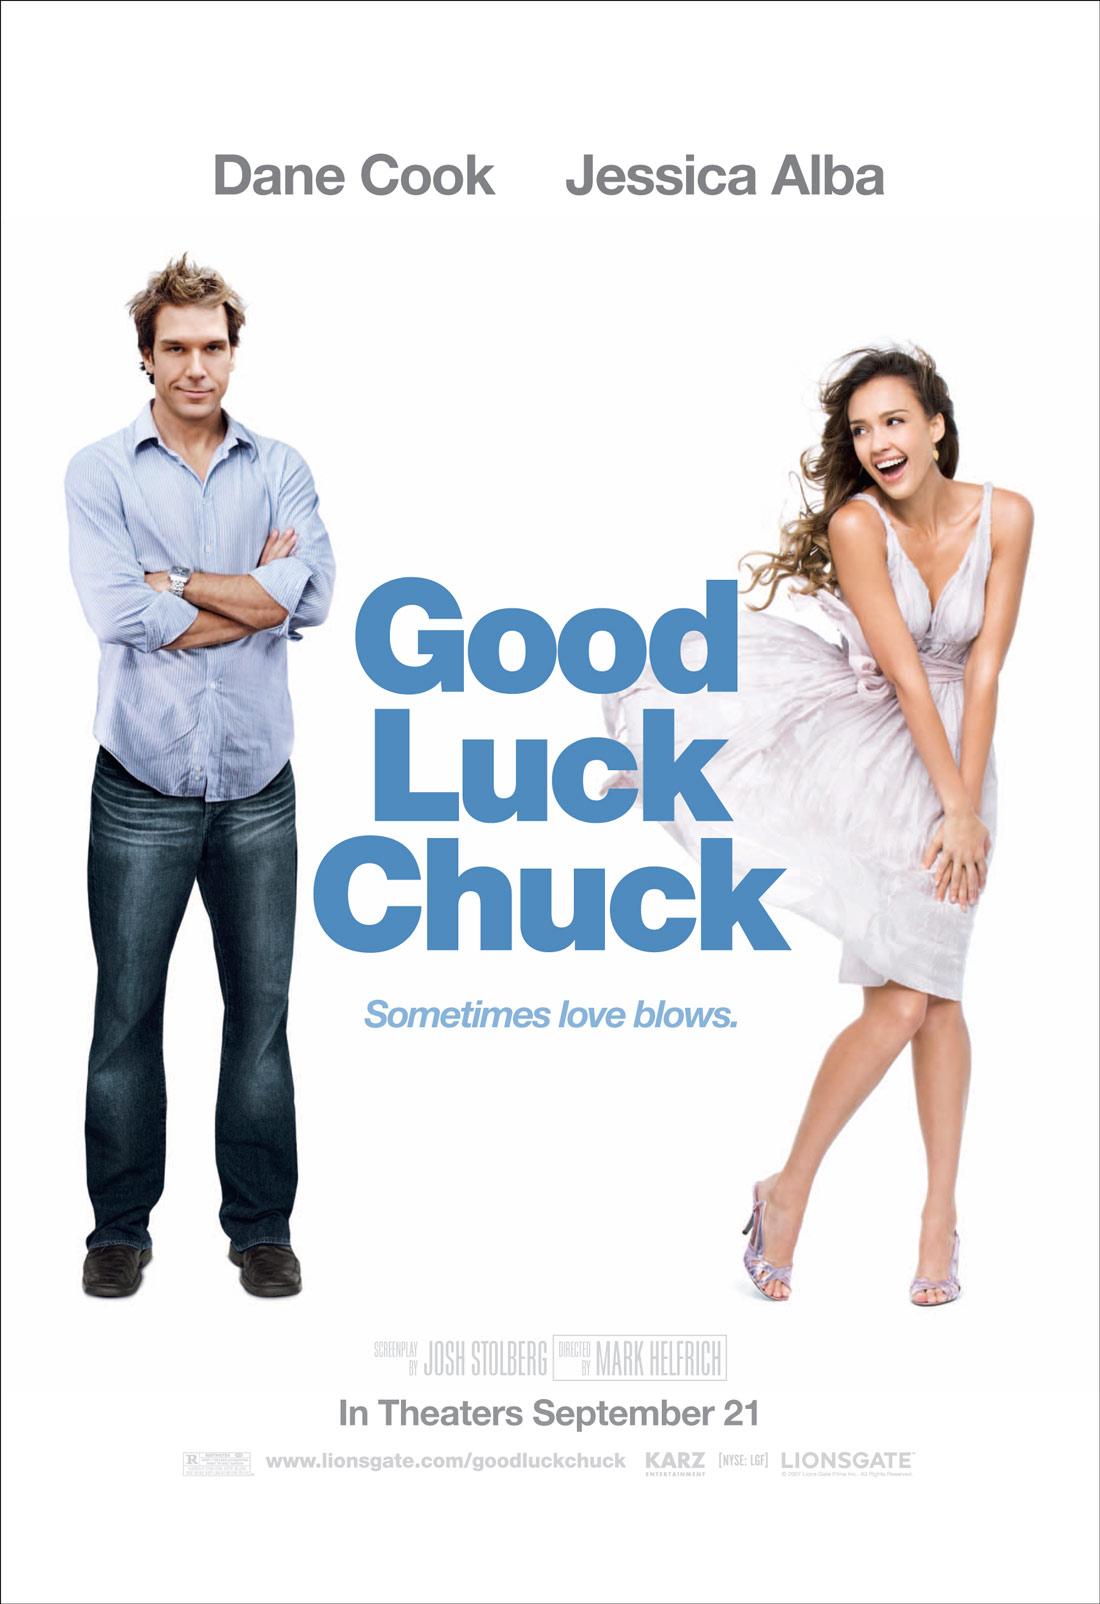 Удачи, Чак! / Good Luck Chuck [UNRATED] (2007) BDRip + DVD9 + BDRip 720p + BDRip 1080p